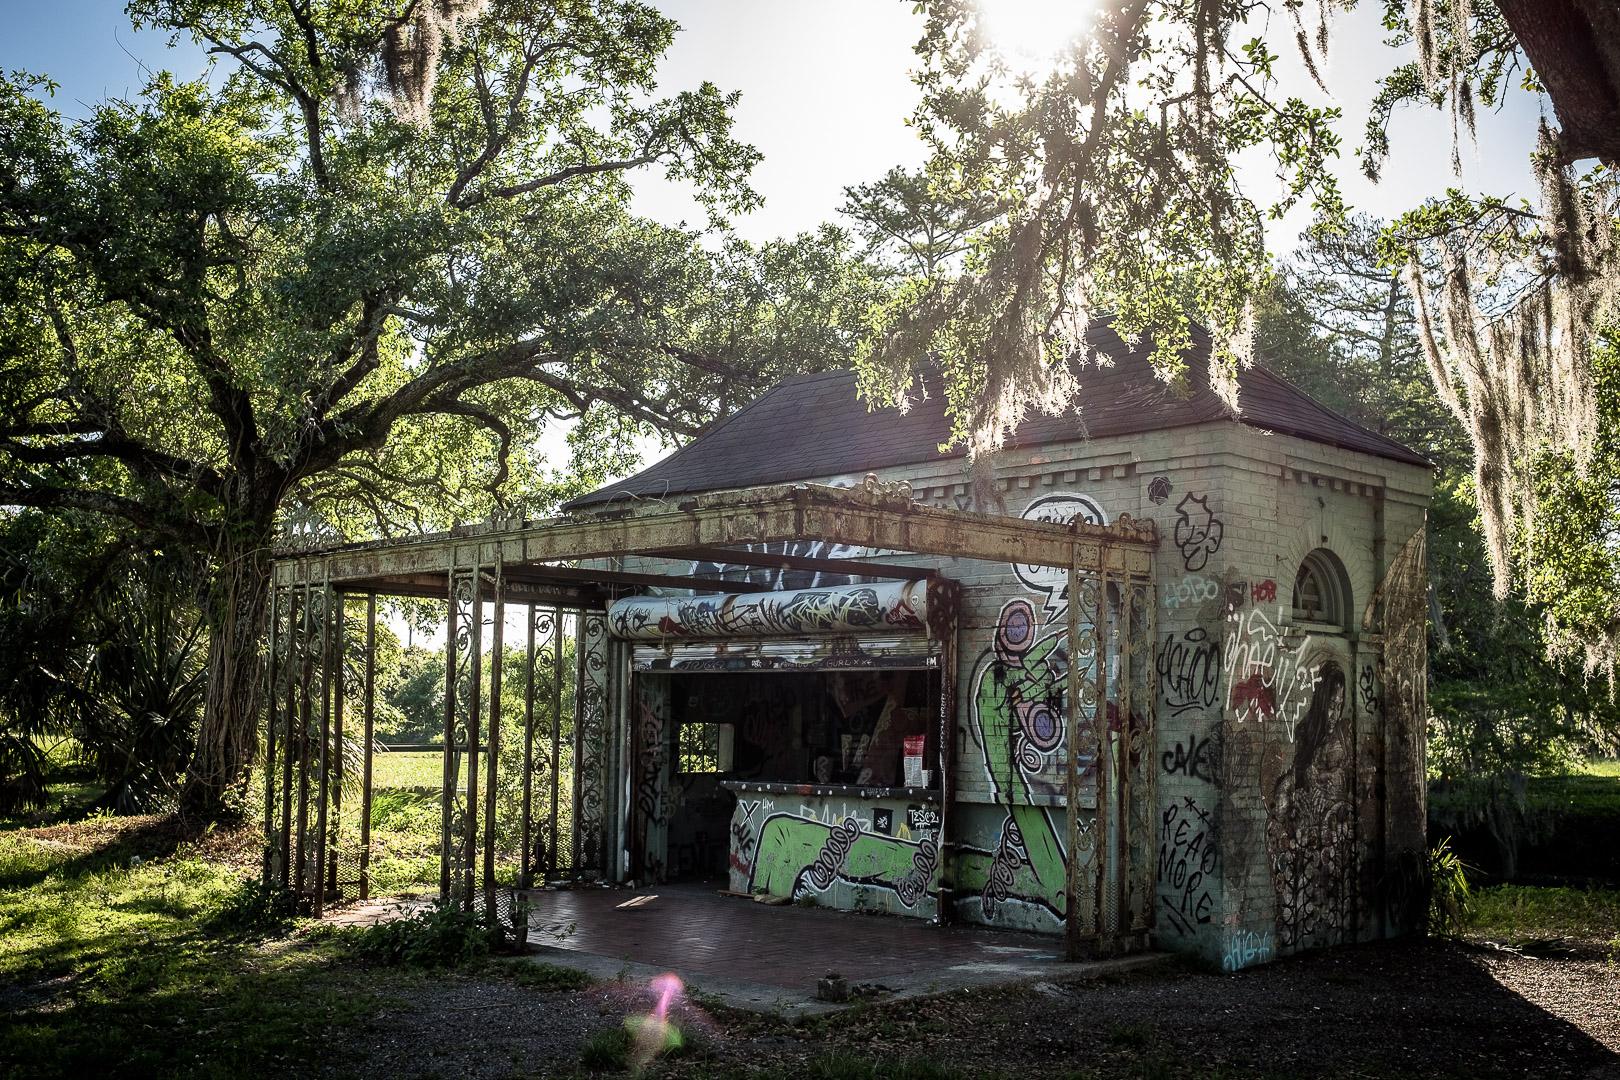 170402-New_Orleans-192-1080.jpg